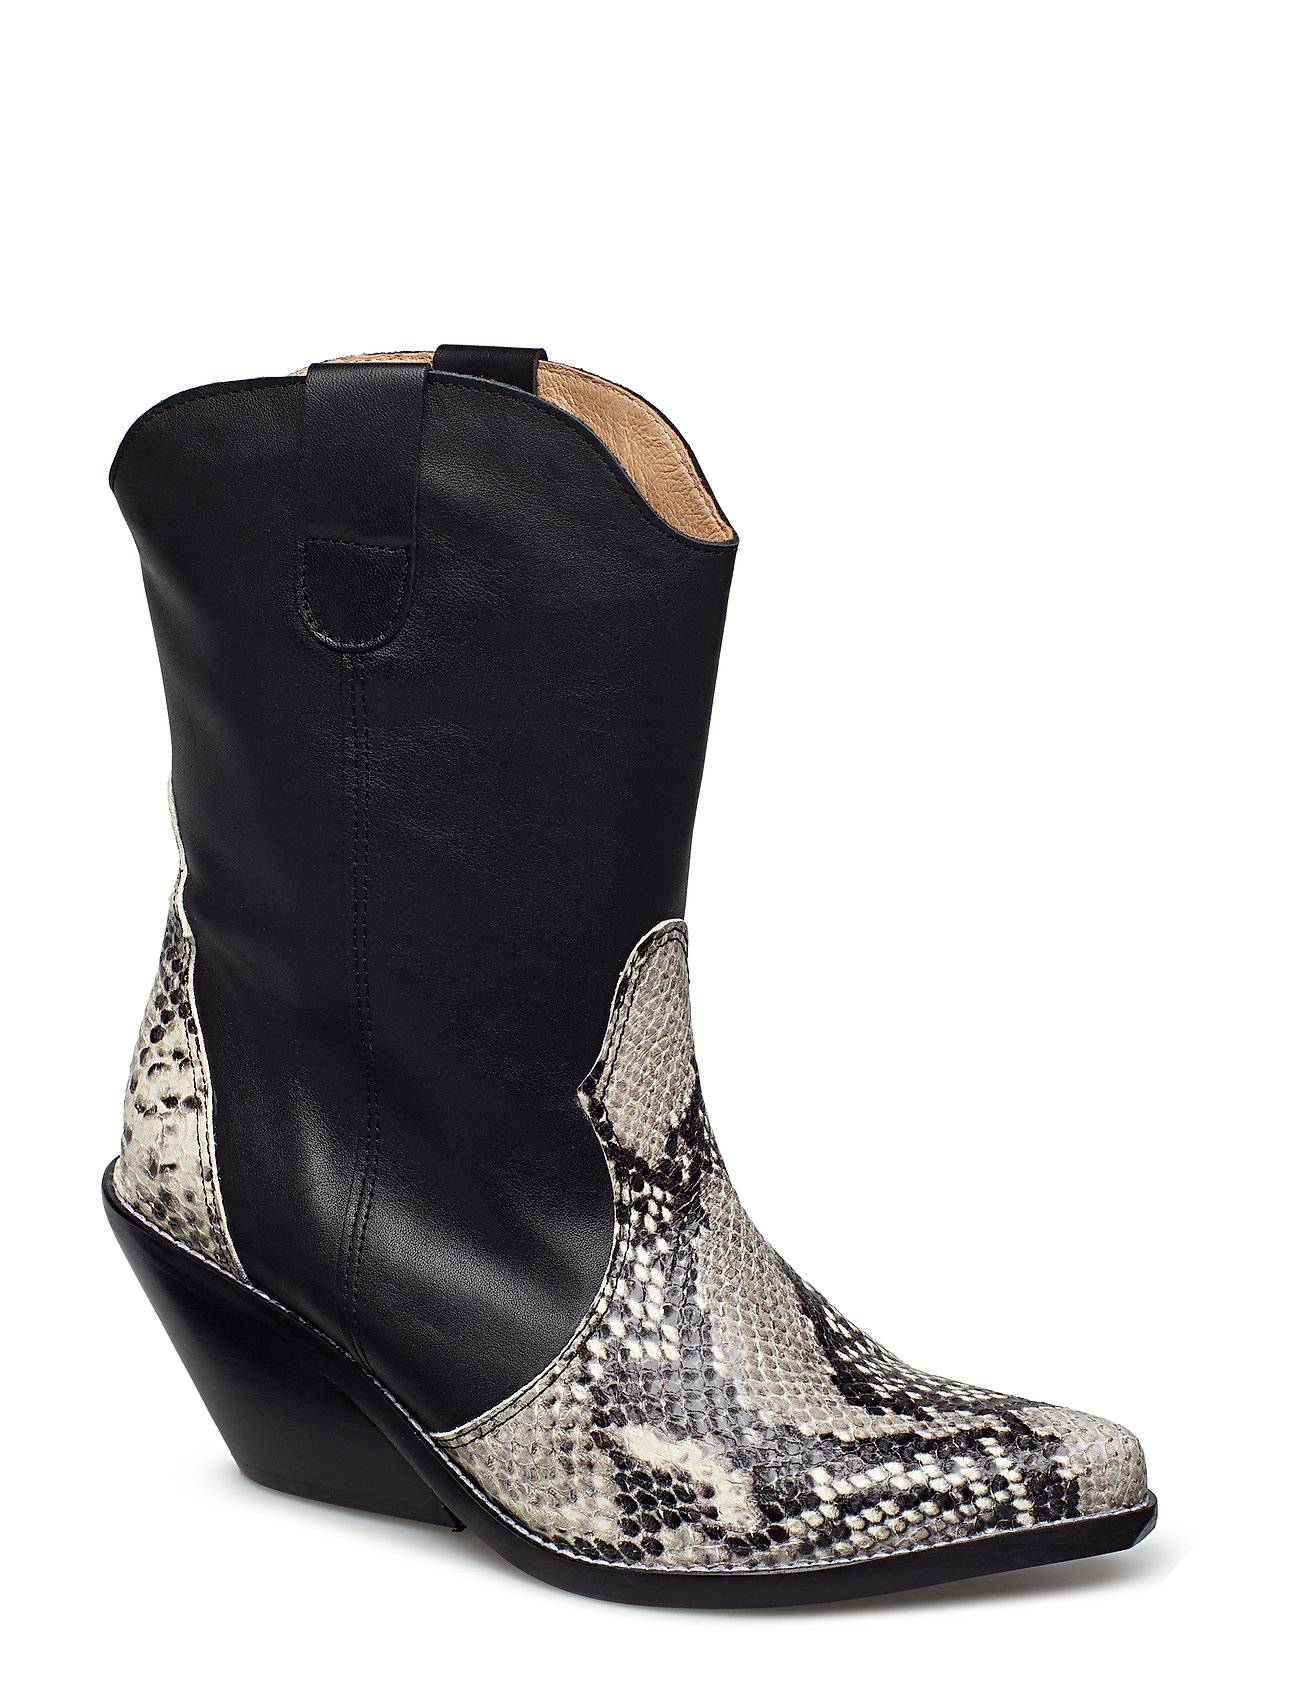 Henry Kole Livia X Snake Grey Shoes Boots Ankle Boots Ankle Boots With Heel Musta Henry Kole